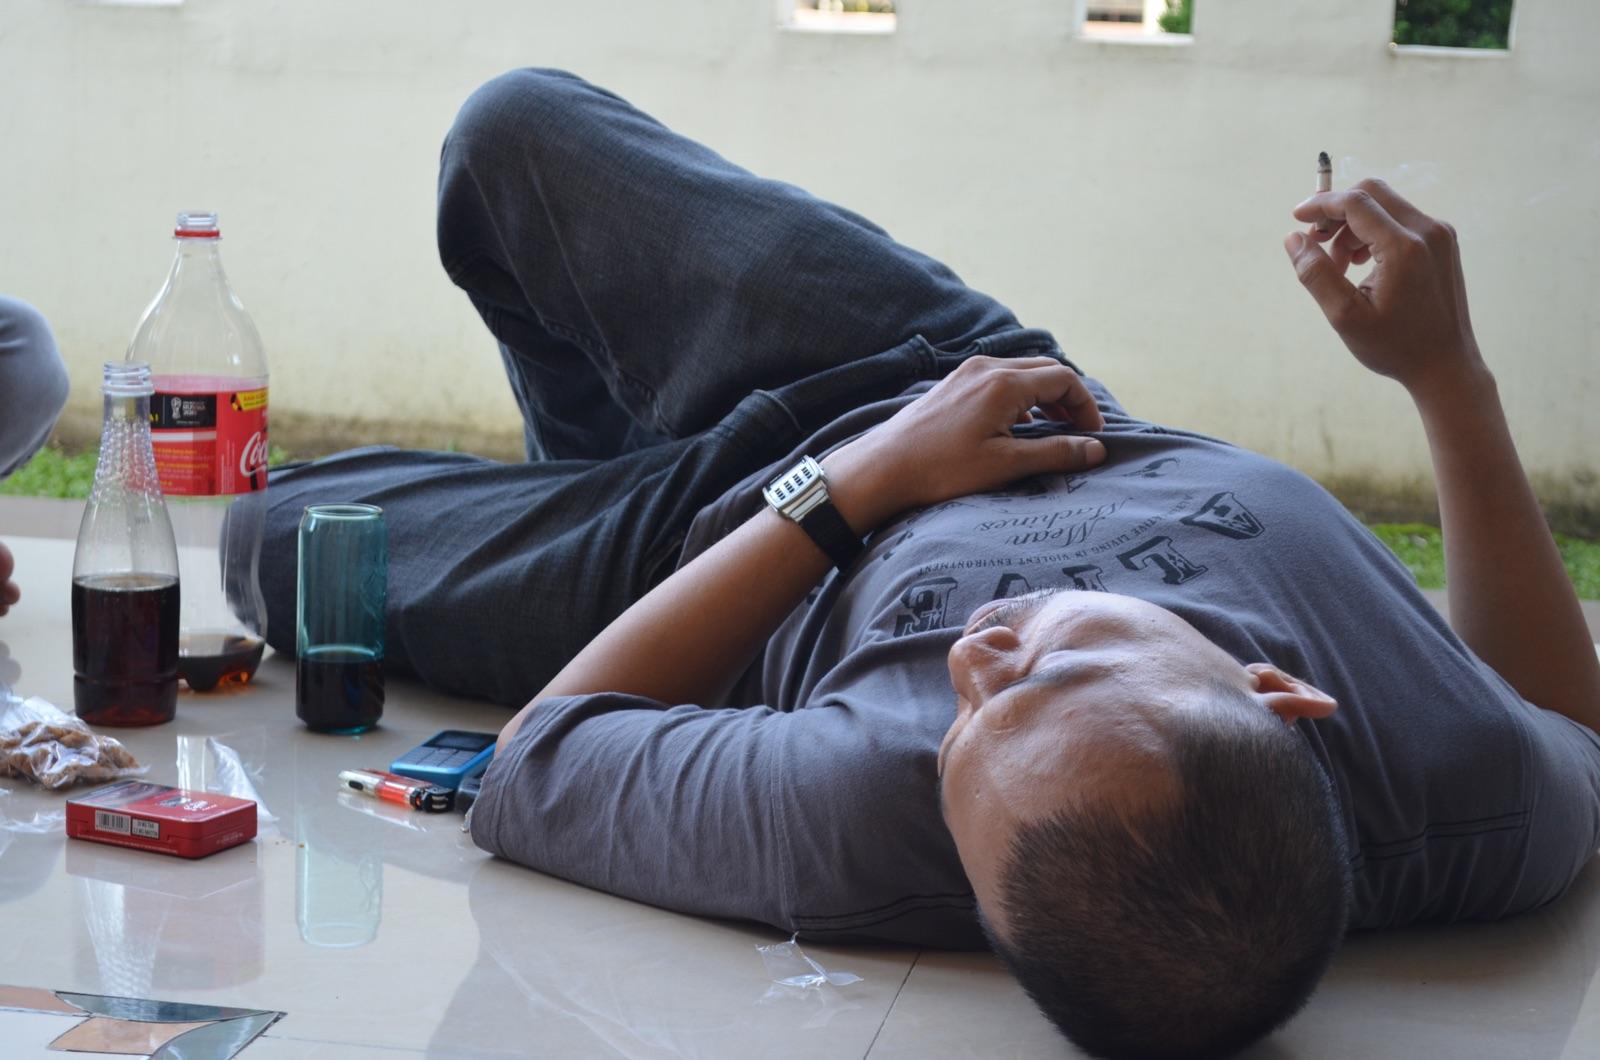 Bootleg Whiskey in Indonesia - New Naratif